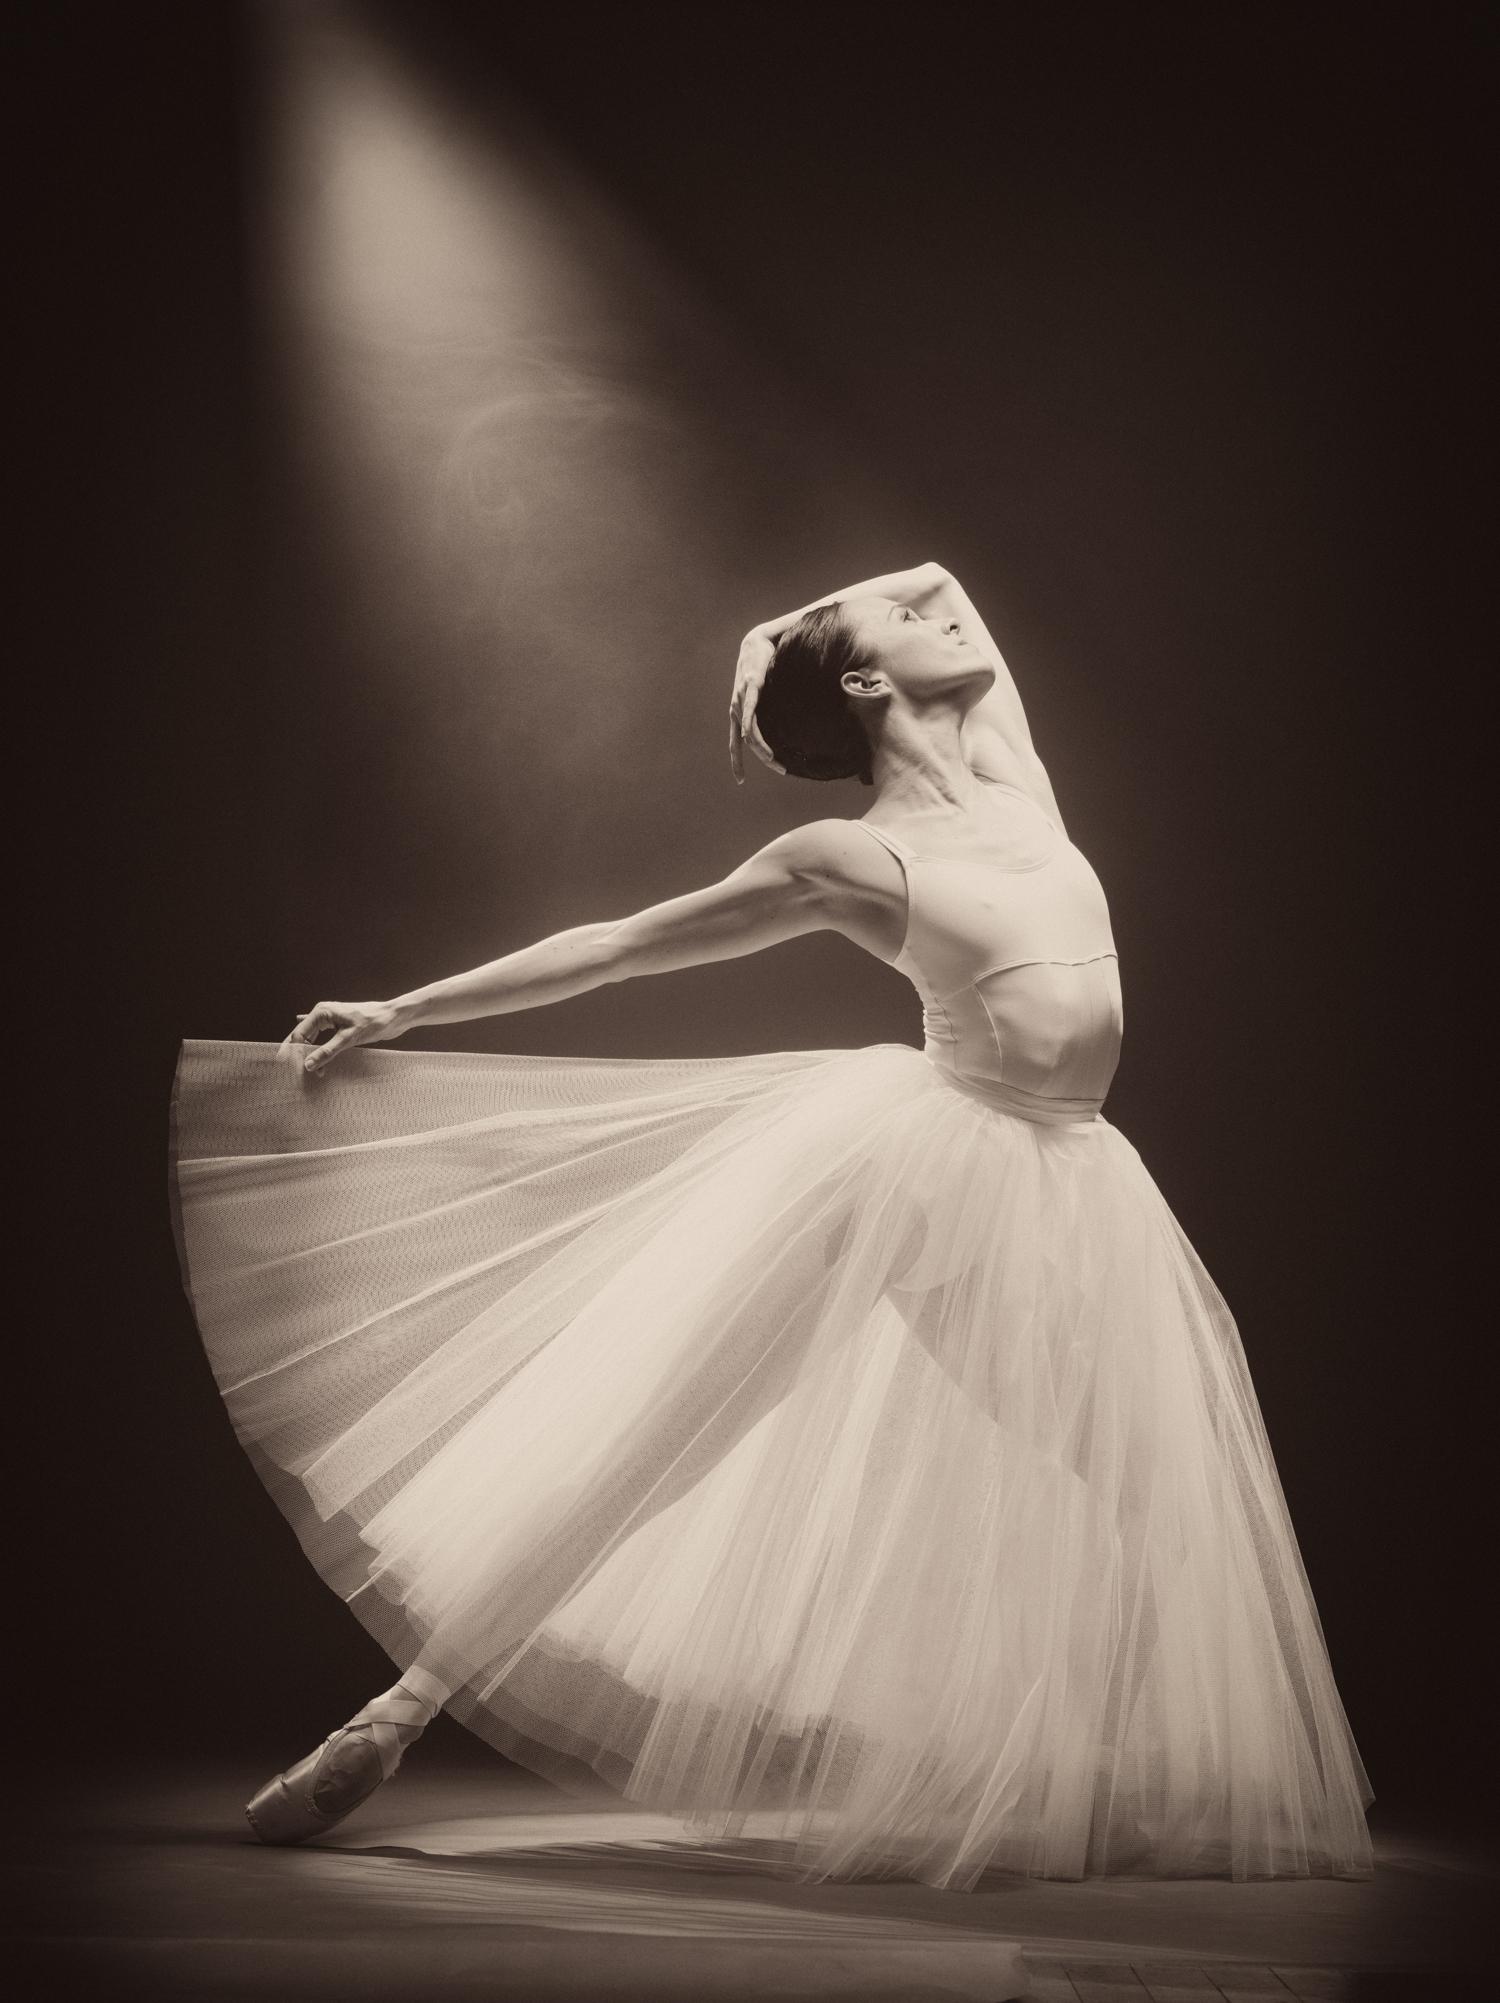 birnbach-dance_photo-20130128-9173.jpg